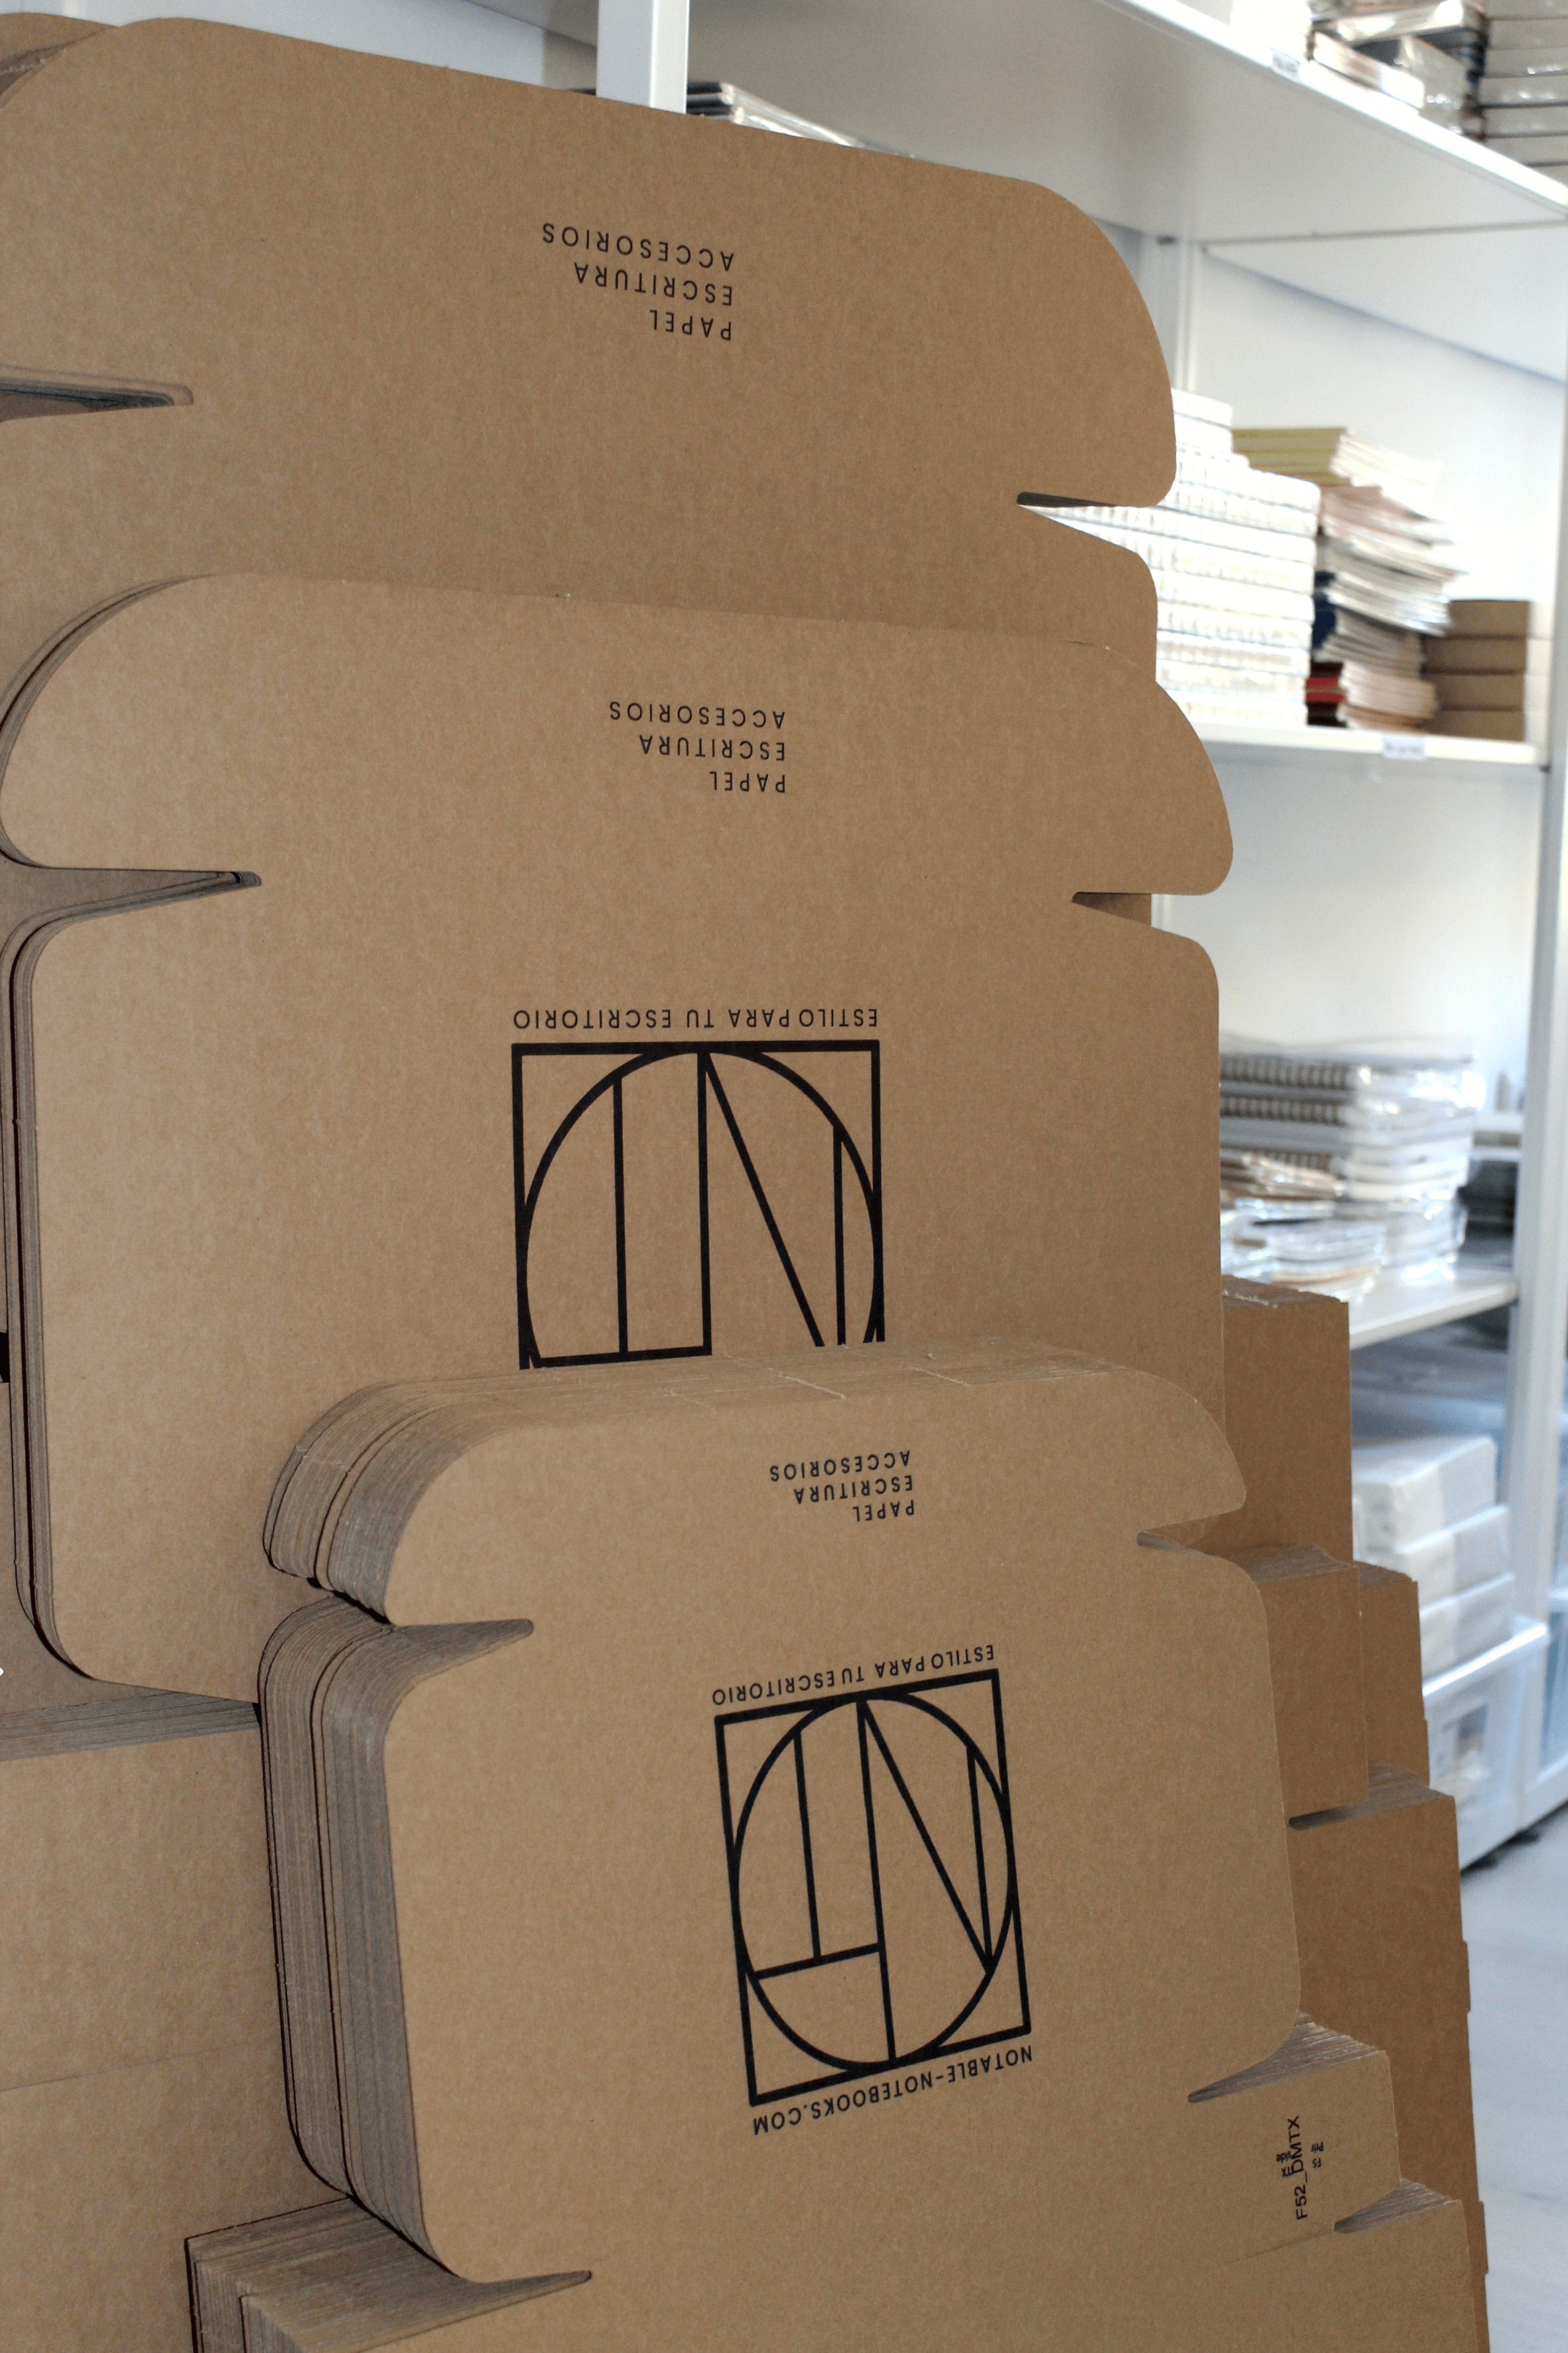 Cajas plegadas de diferentes tamaños